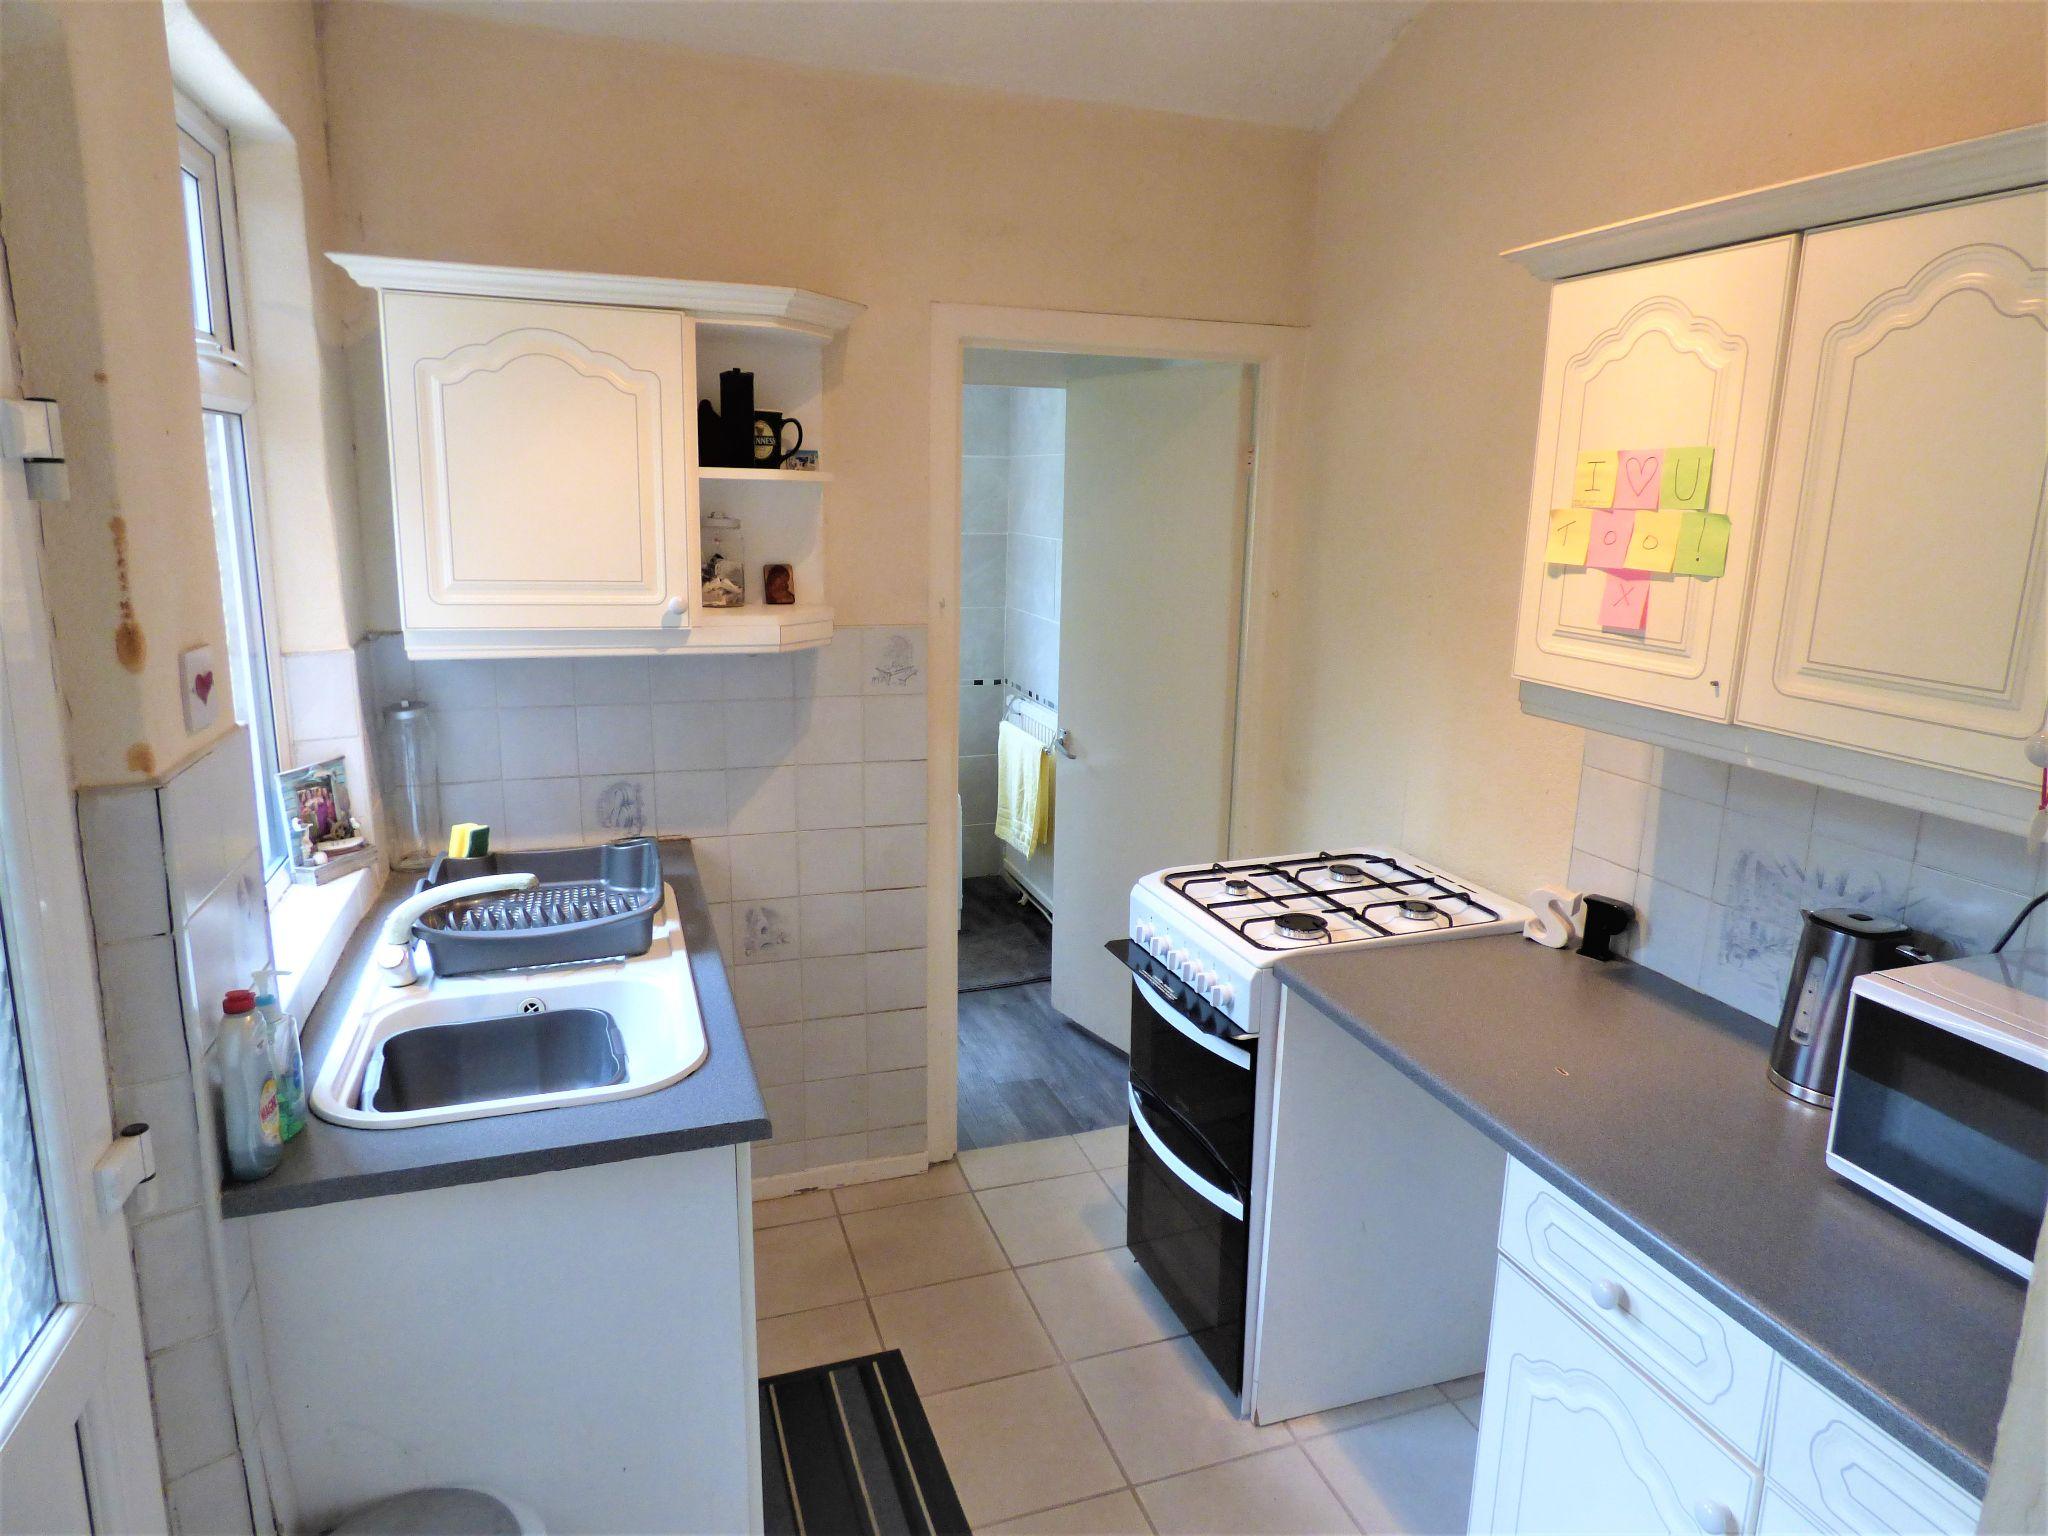 2 Bedroom Semi-detached House For Sale - Kitchen